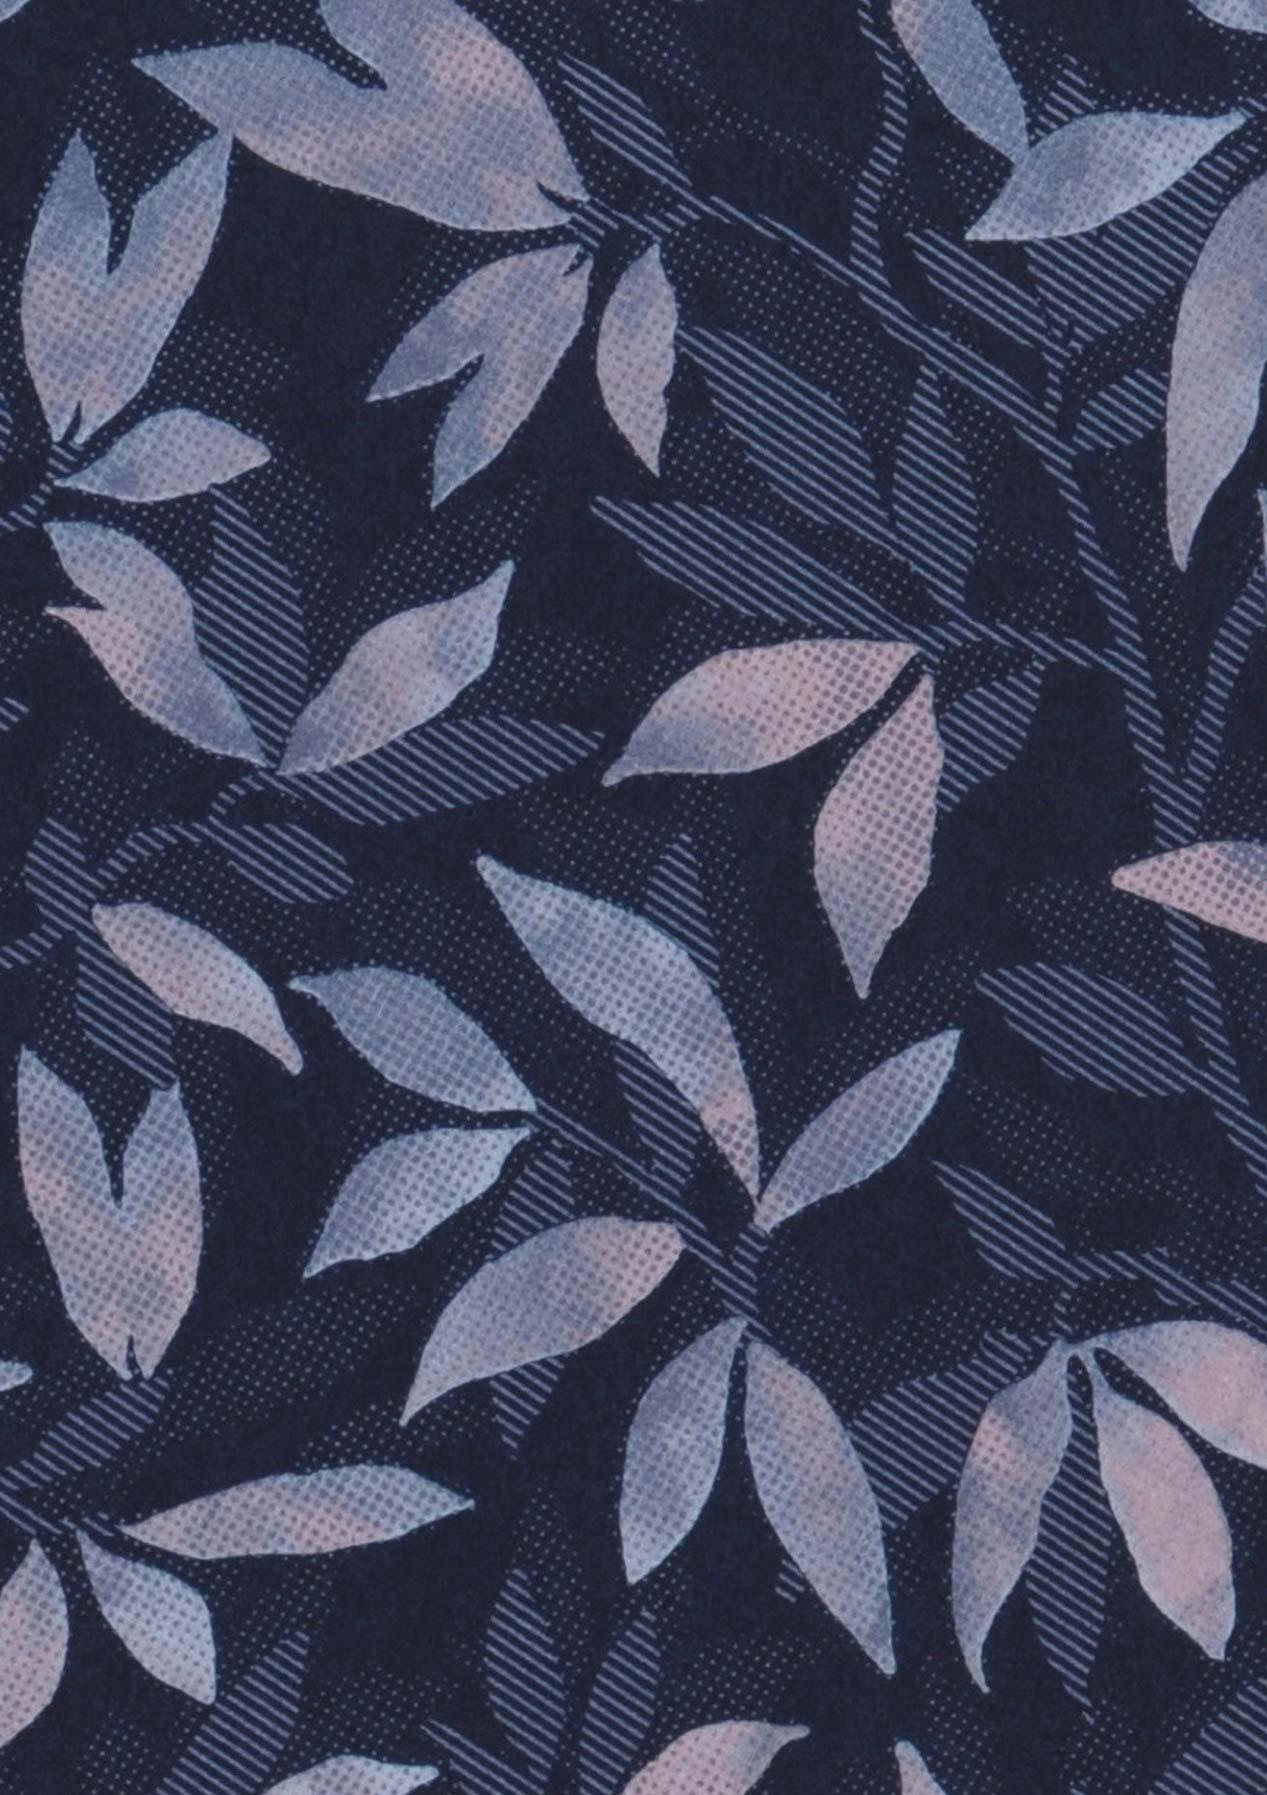 Tapete dagista graublau blassblau taubenblau zartrosa for Tapete taubenblau